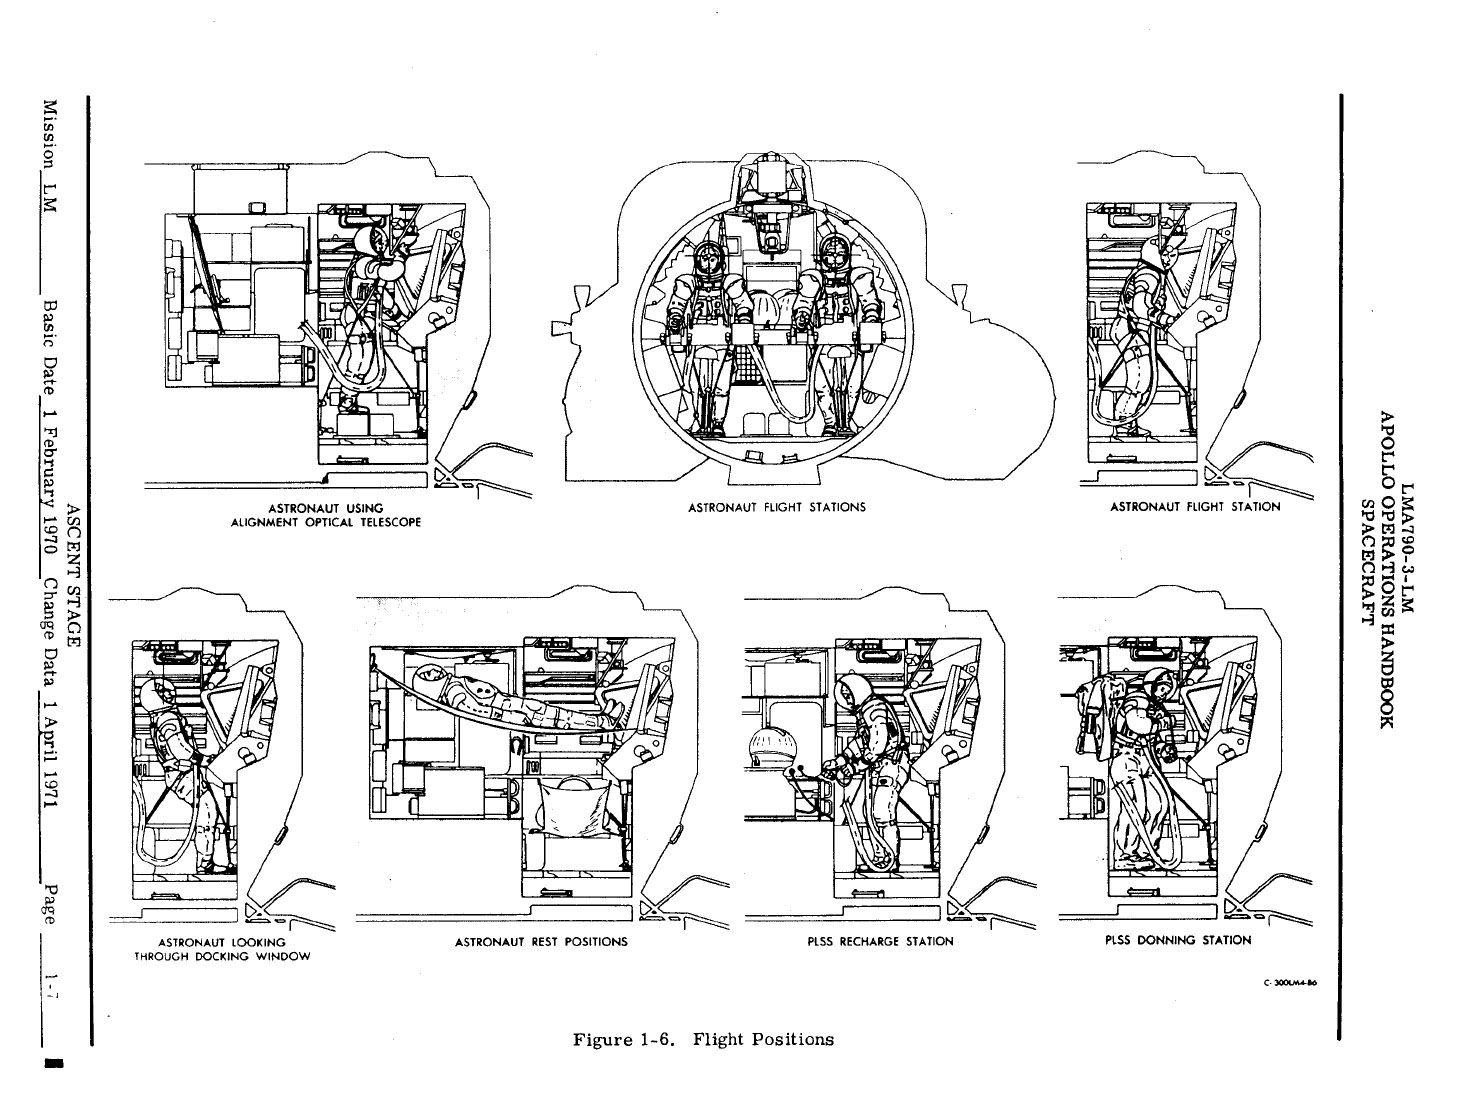 diagram from apollo operations handbook on lunar module flight positions  [1458x1105] - imgur